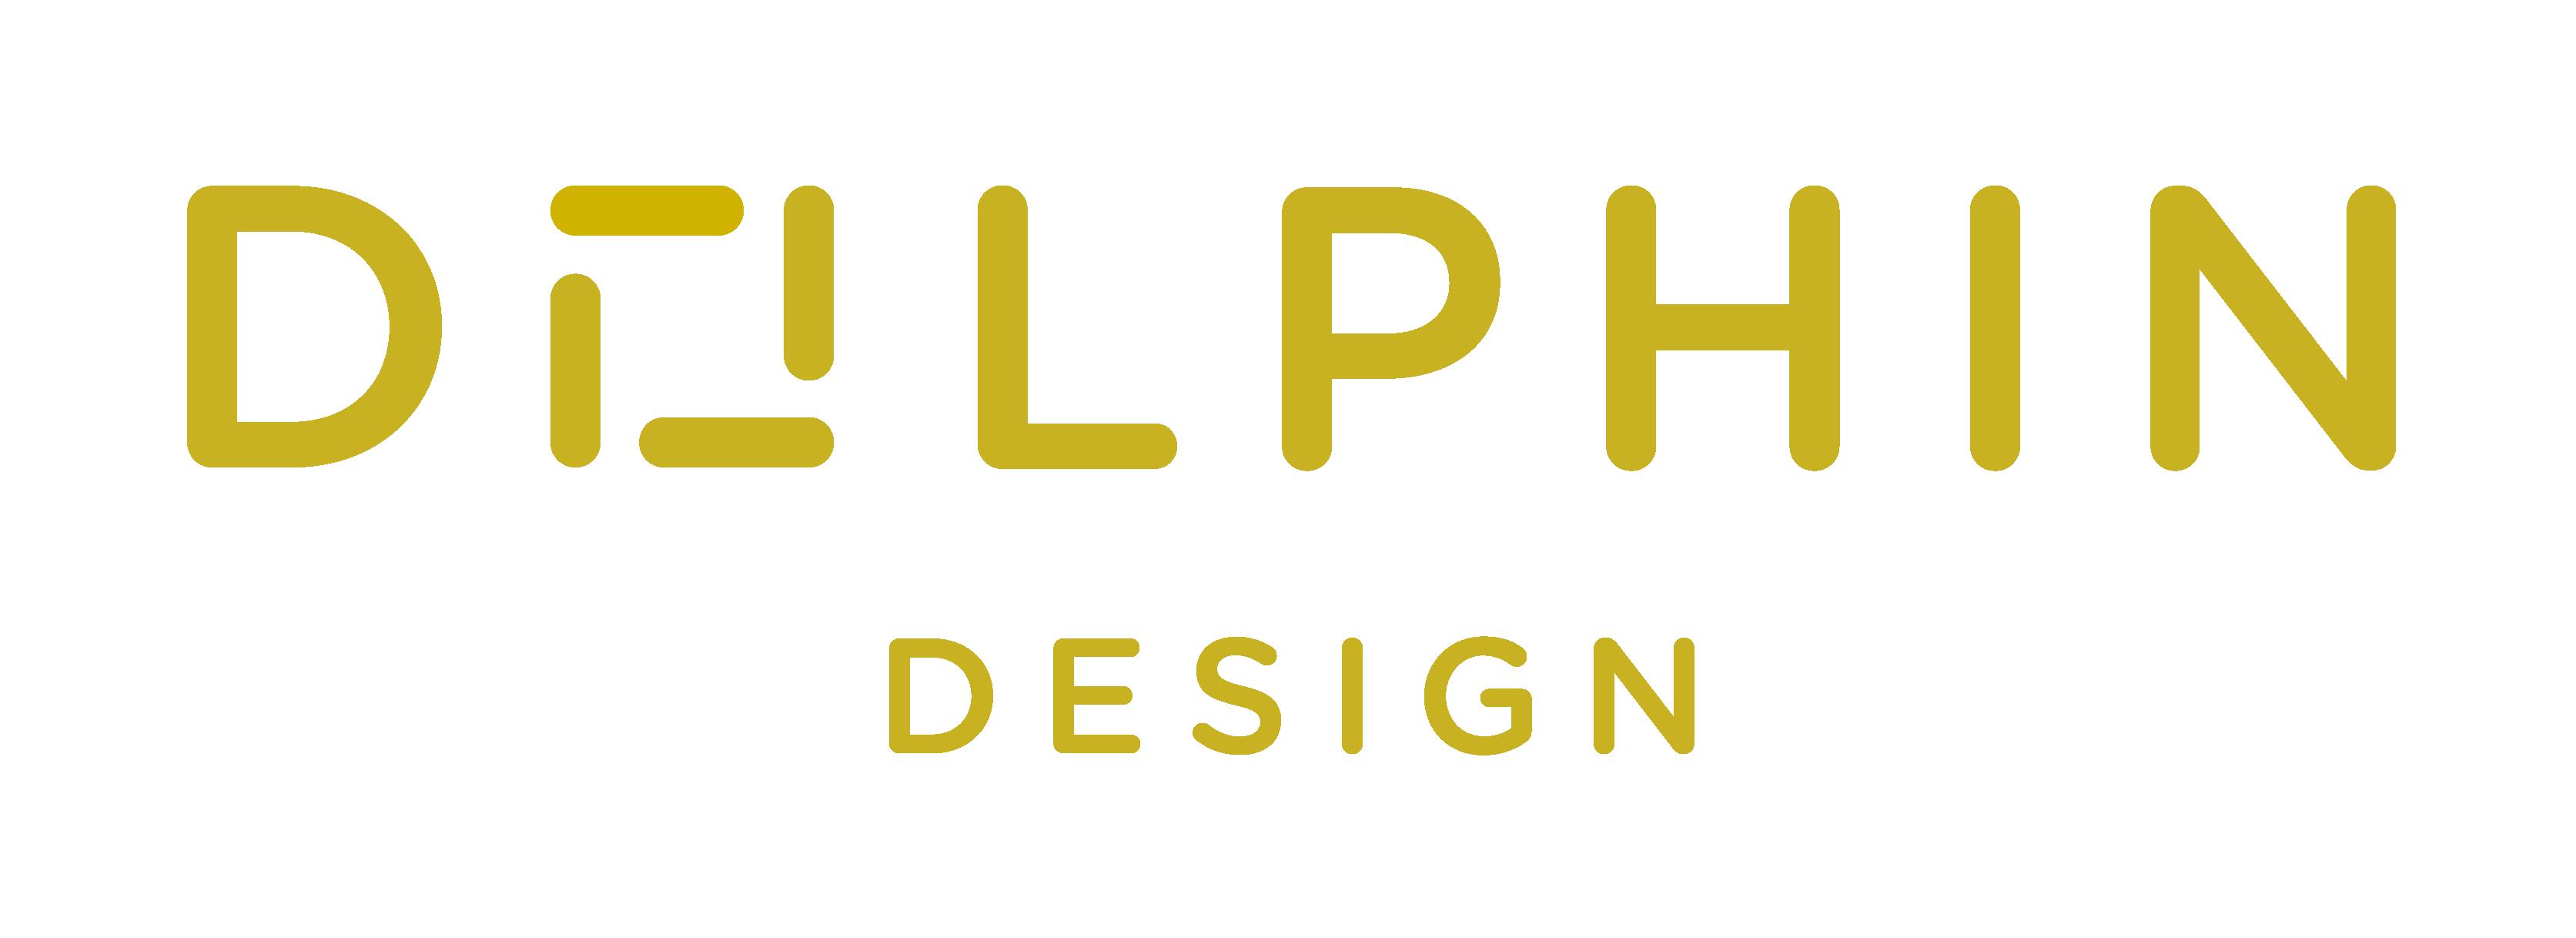 DOLPHIN DESIGN